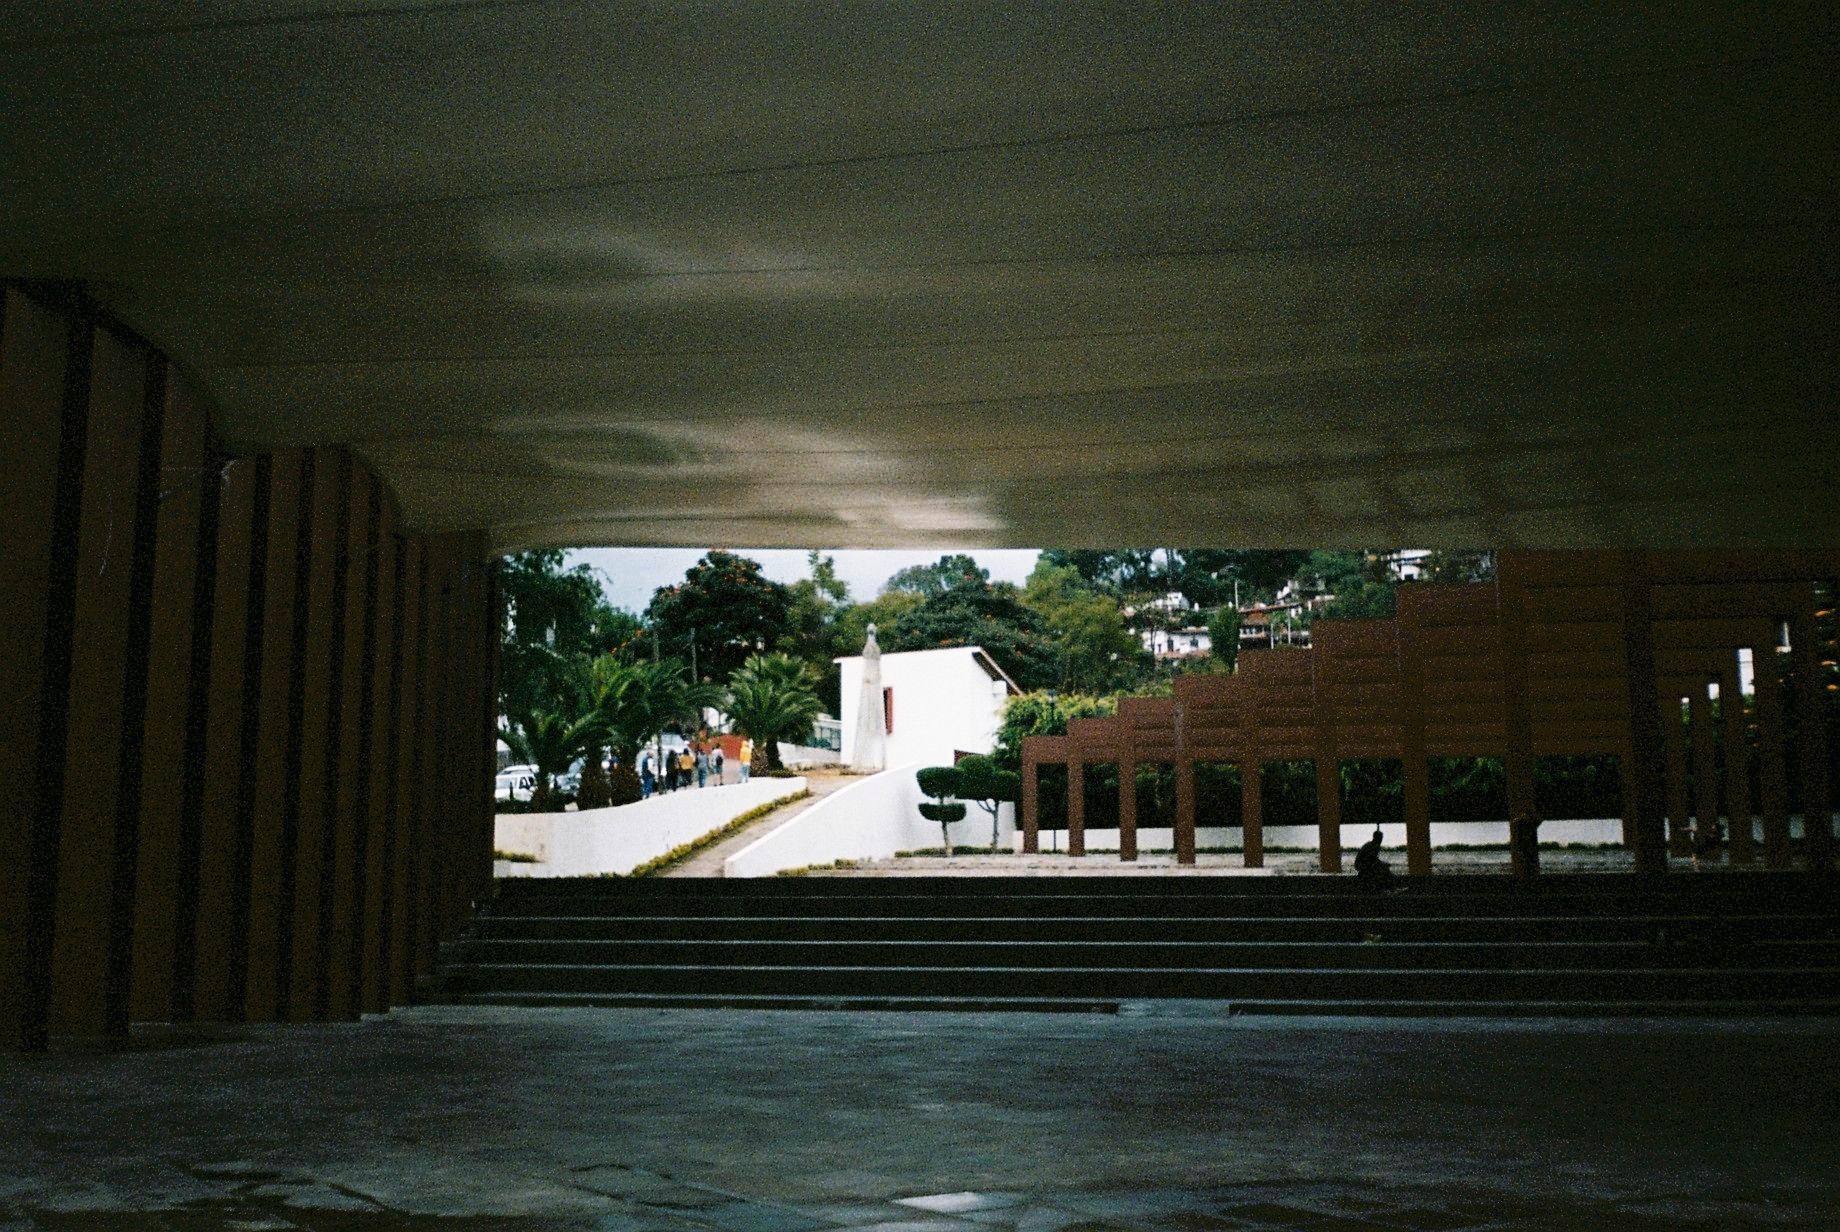 Valle De Bravo 01-2020 - 38 of 51